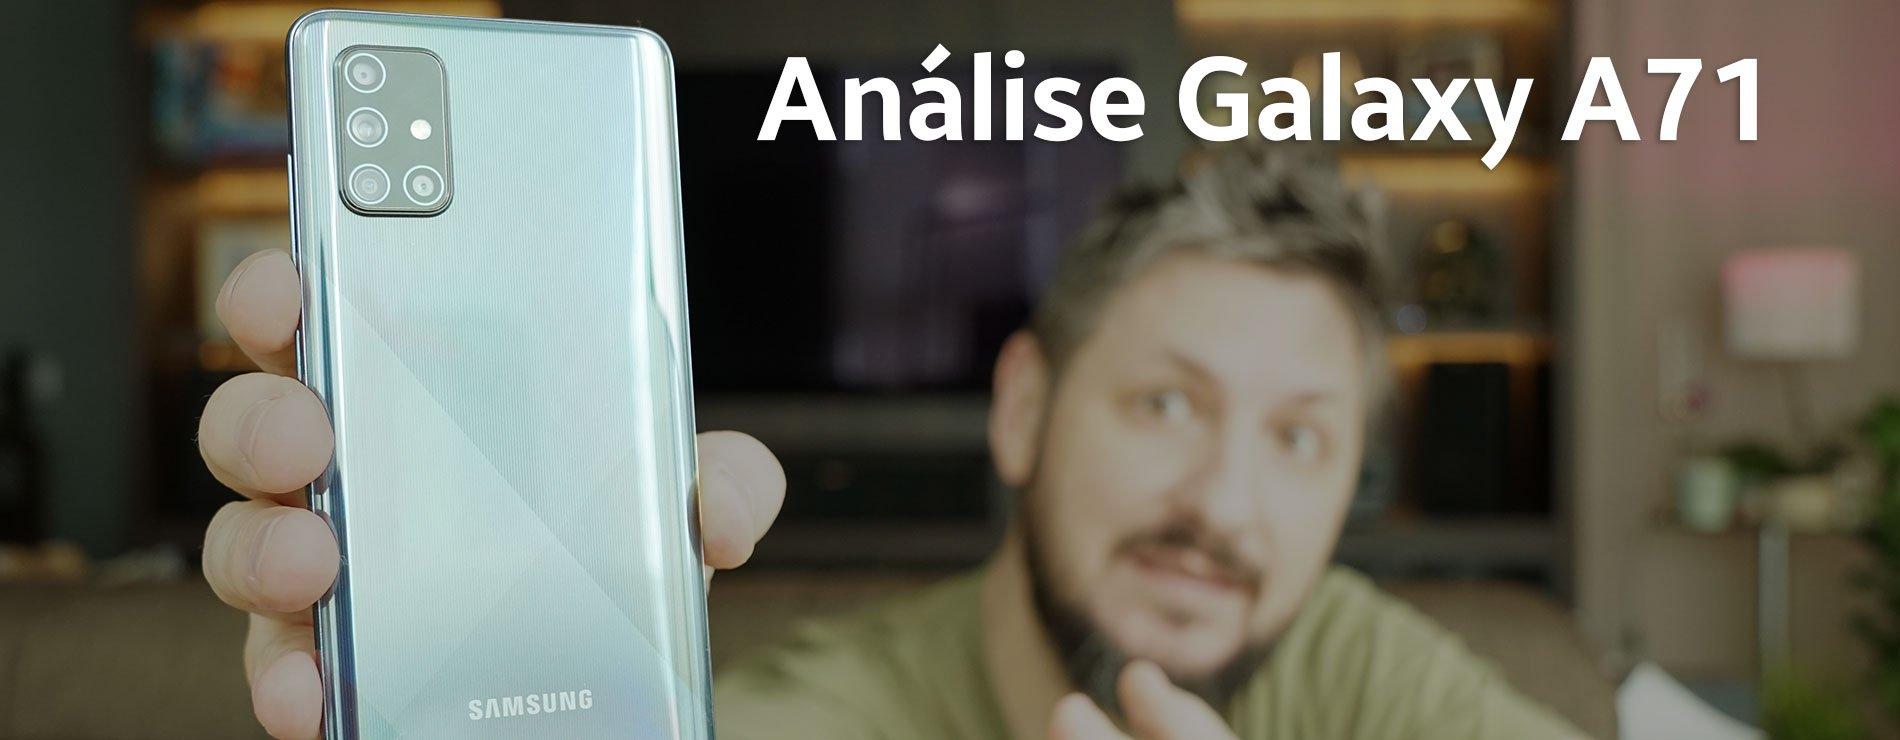 Análise do Samsung Galaxy A71: 6 meses depois, vale a pena?